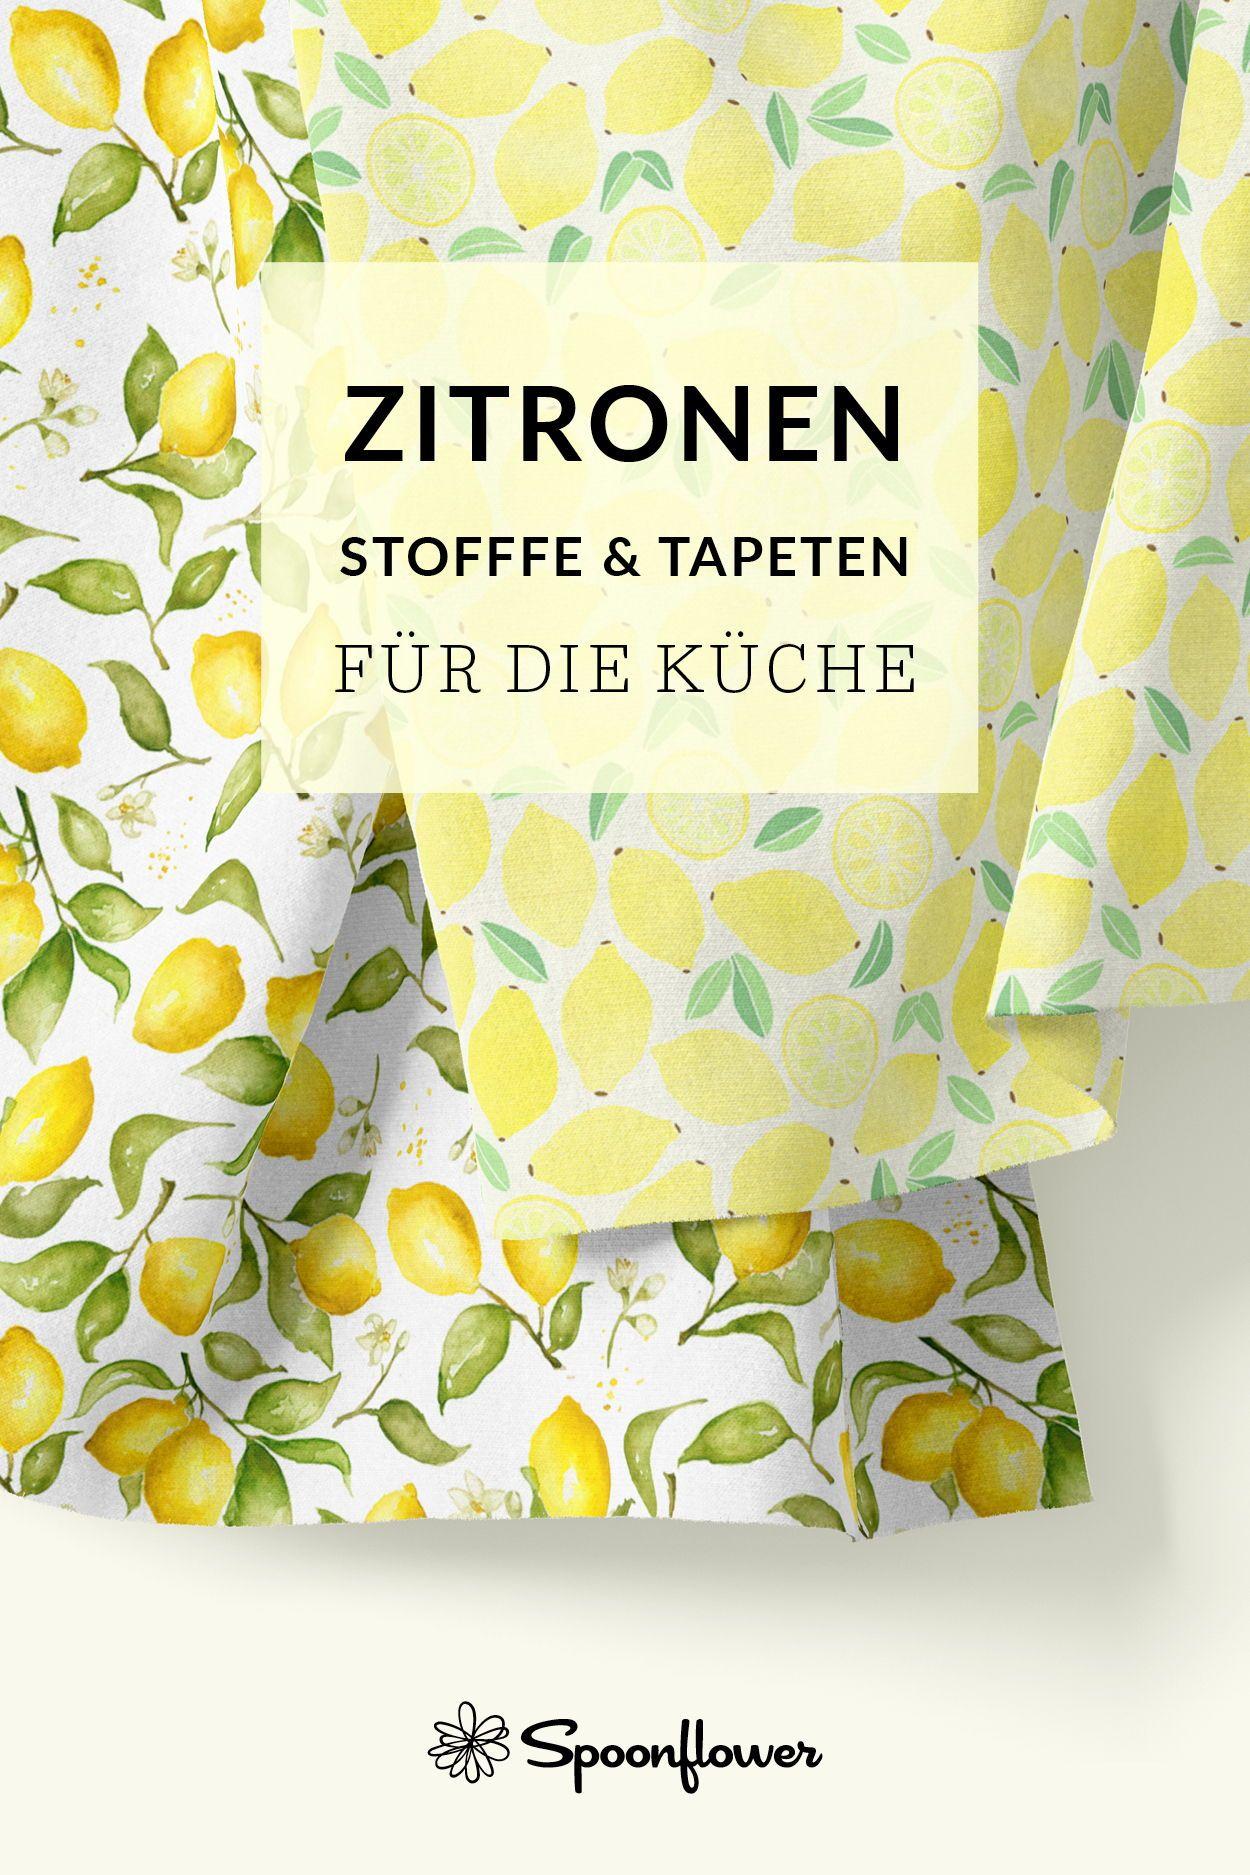 Zitronen Stoffe Und Tapeten Spoonflower In 2020 Fabric Web Design Tips Wallpaper